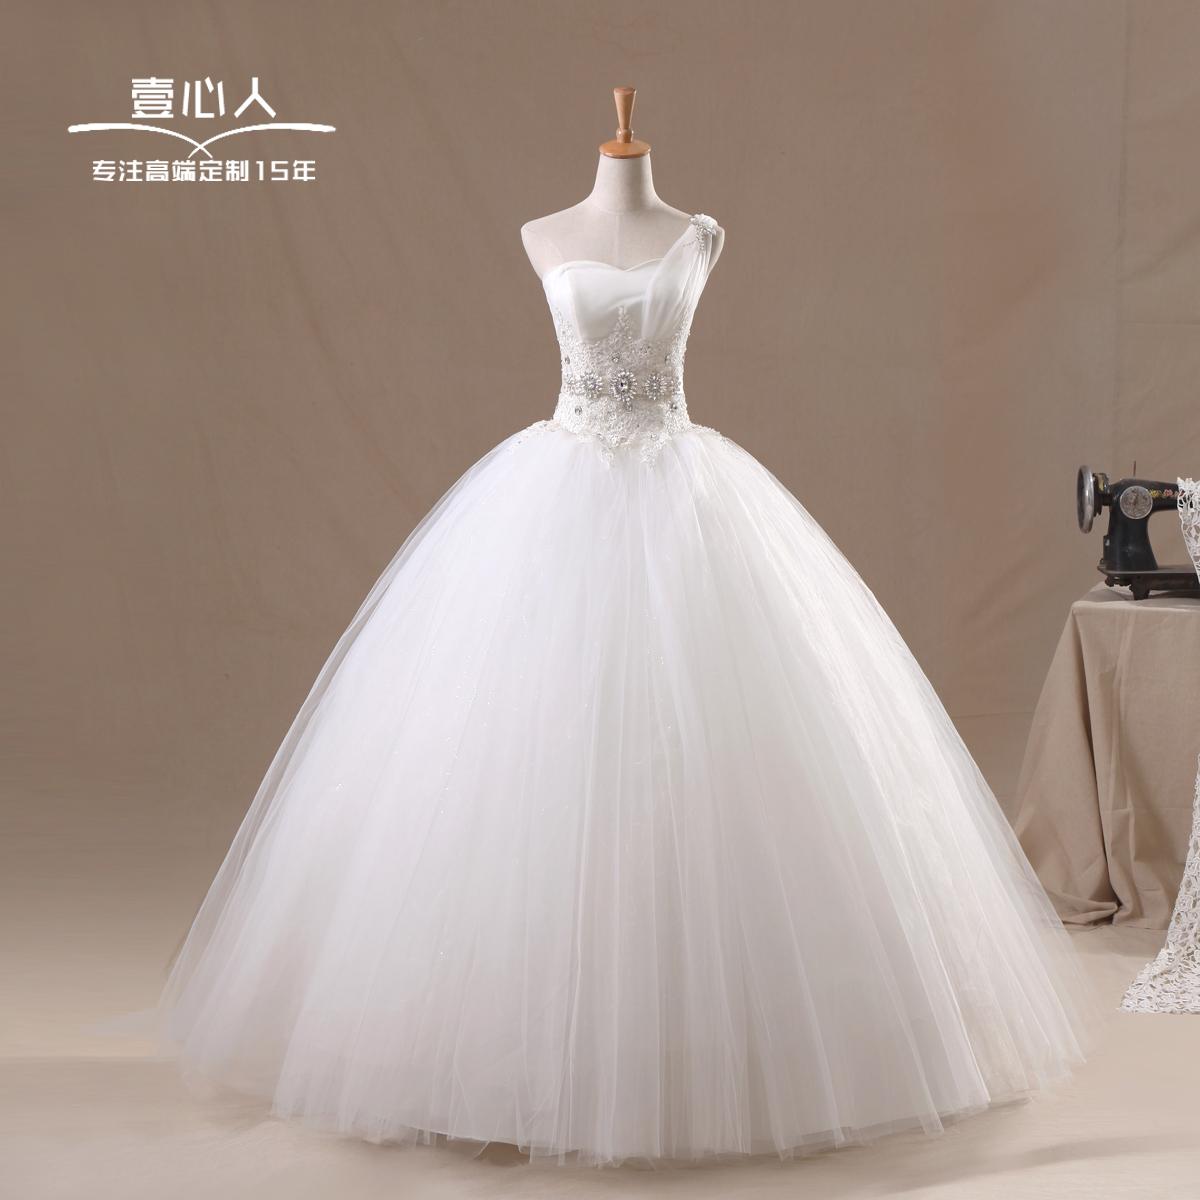 بالصور صور ملابس اعراس , اجمل فساتين الافراح 4951 6